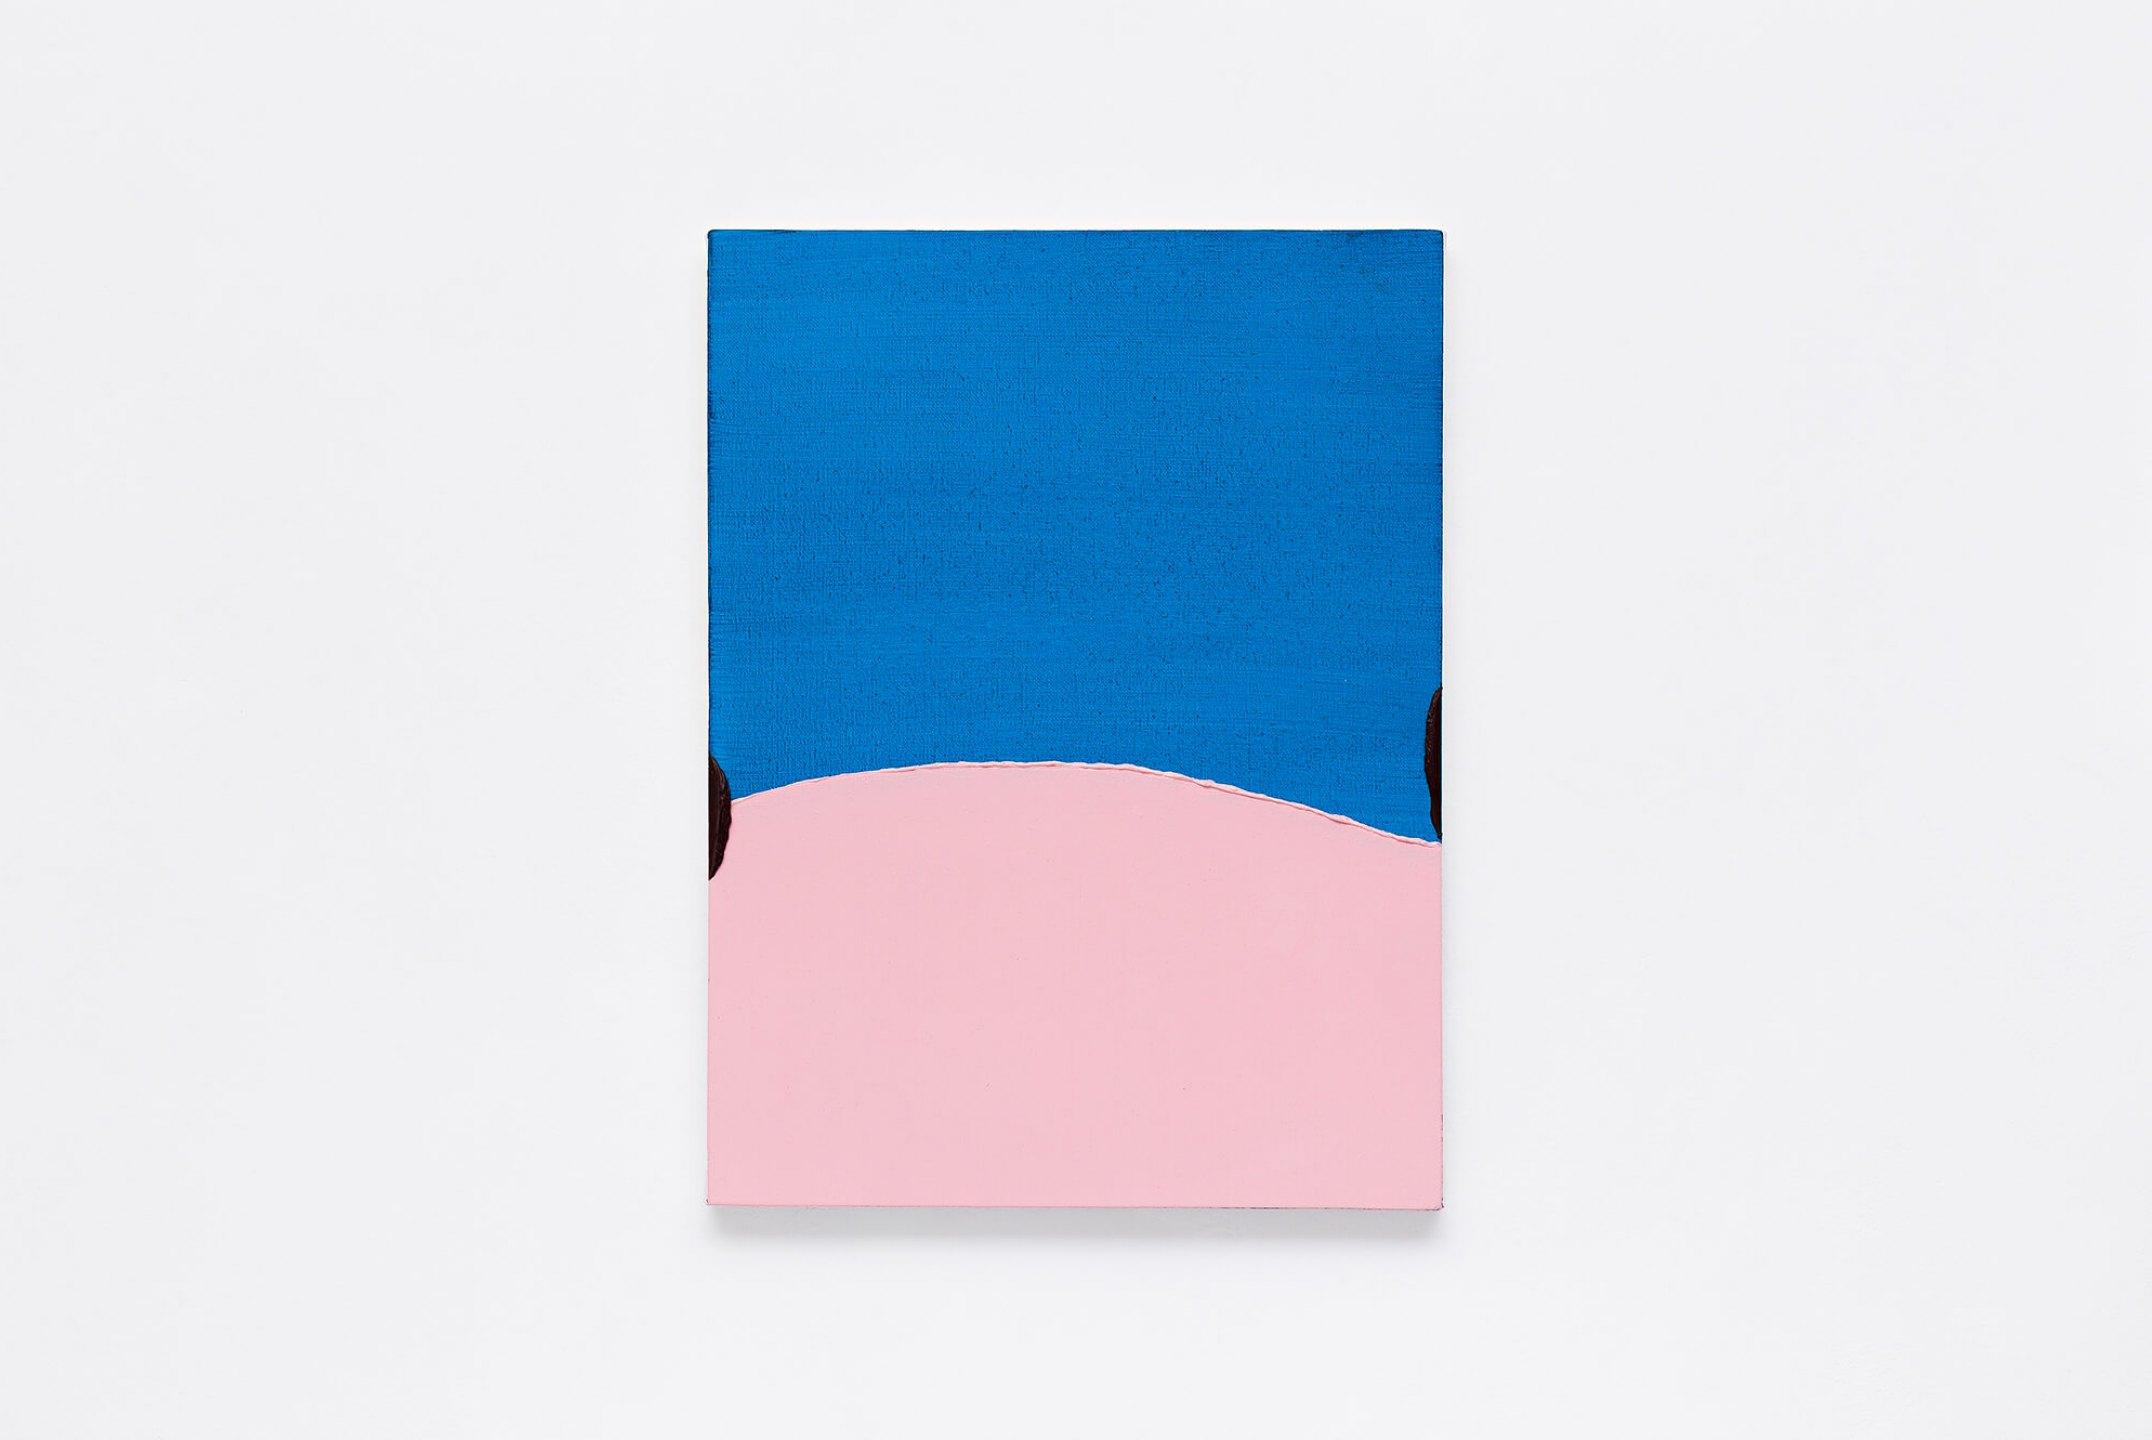 Paulo Monteiro,<em>untitled</em>,2013, oil on linen, 40×30 cm - Mendes Wood DM